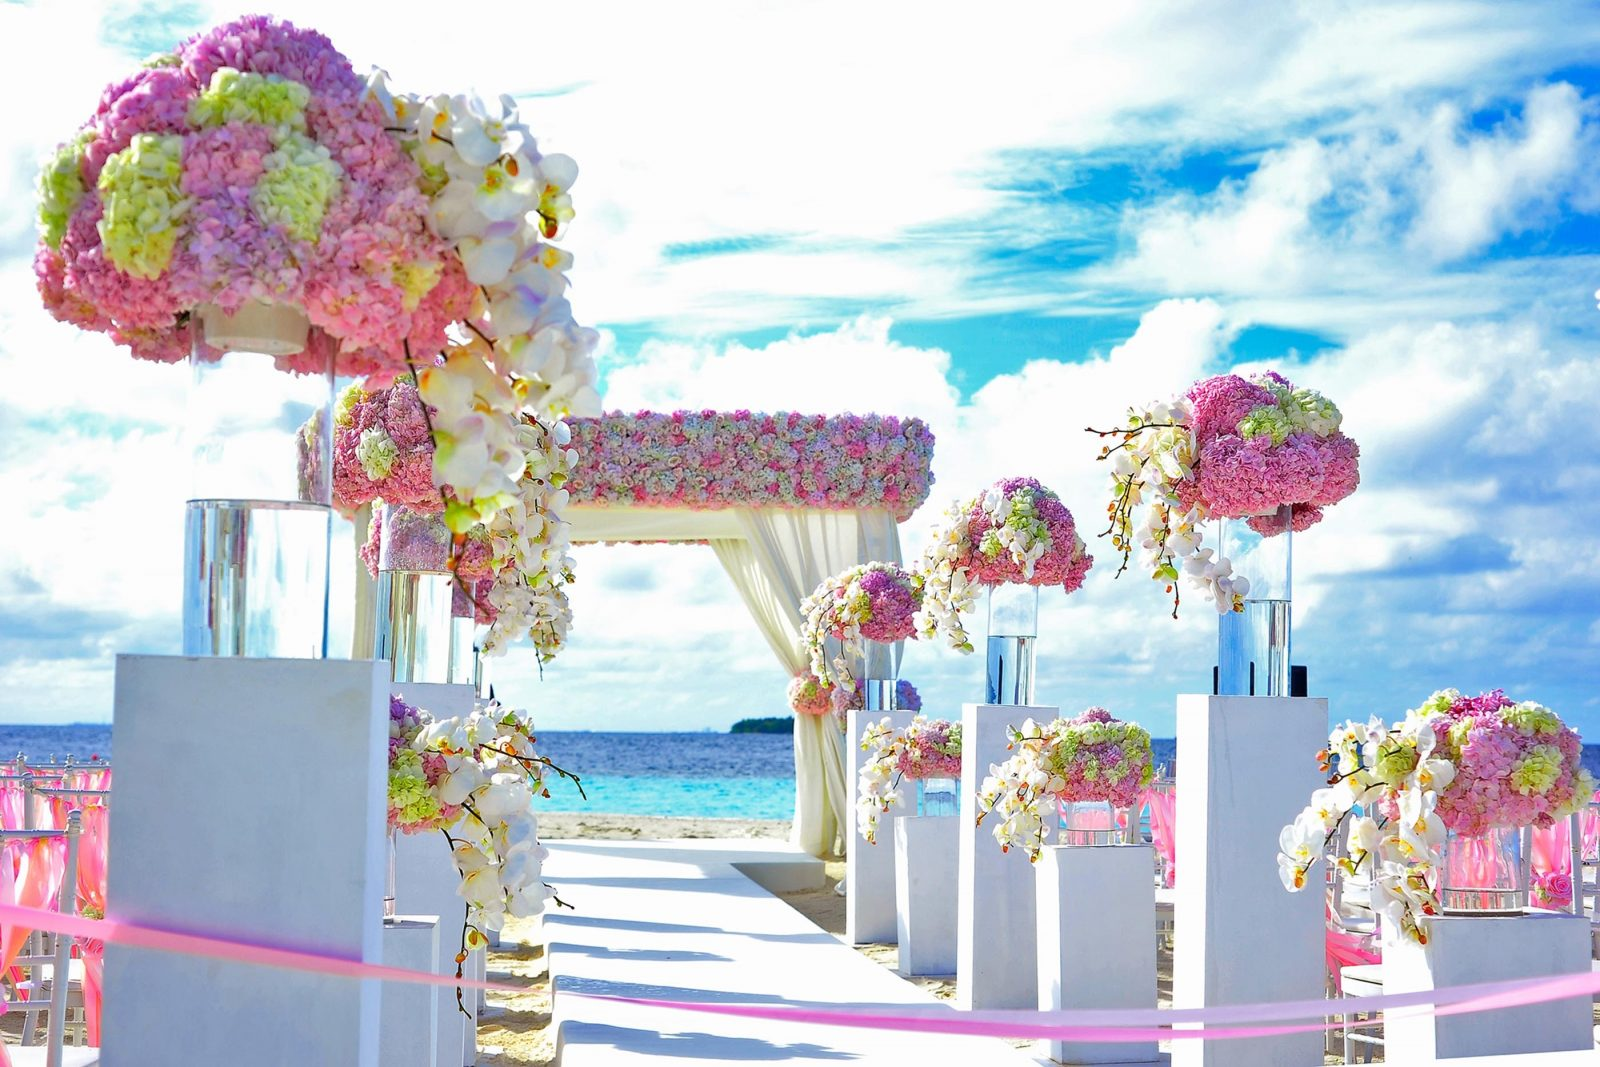 Wedding-Decor-Ideas-with-clarence-house-Belmore-sydney-australia